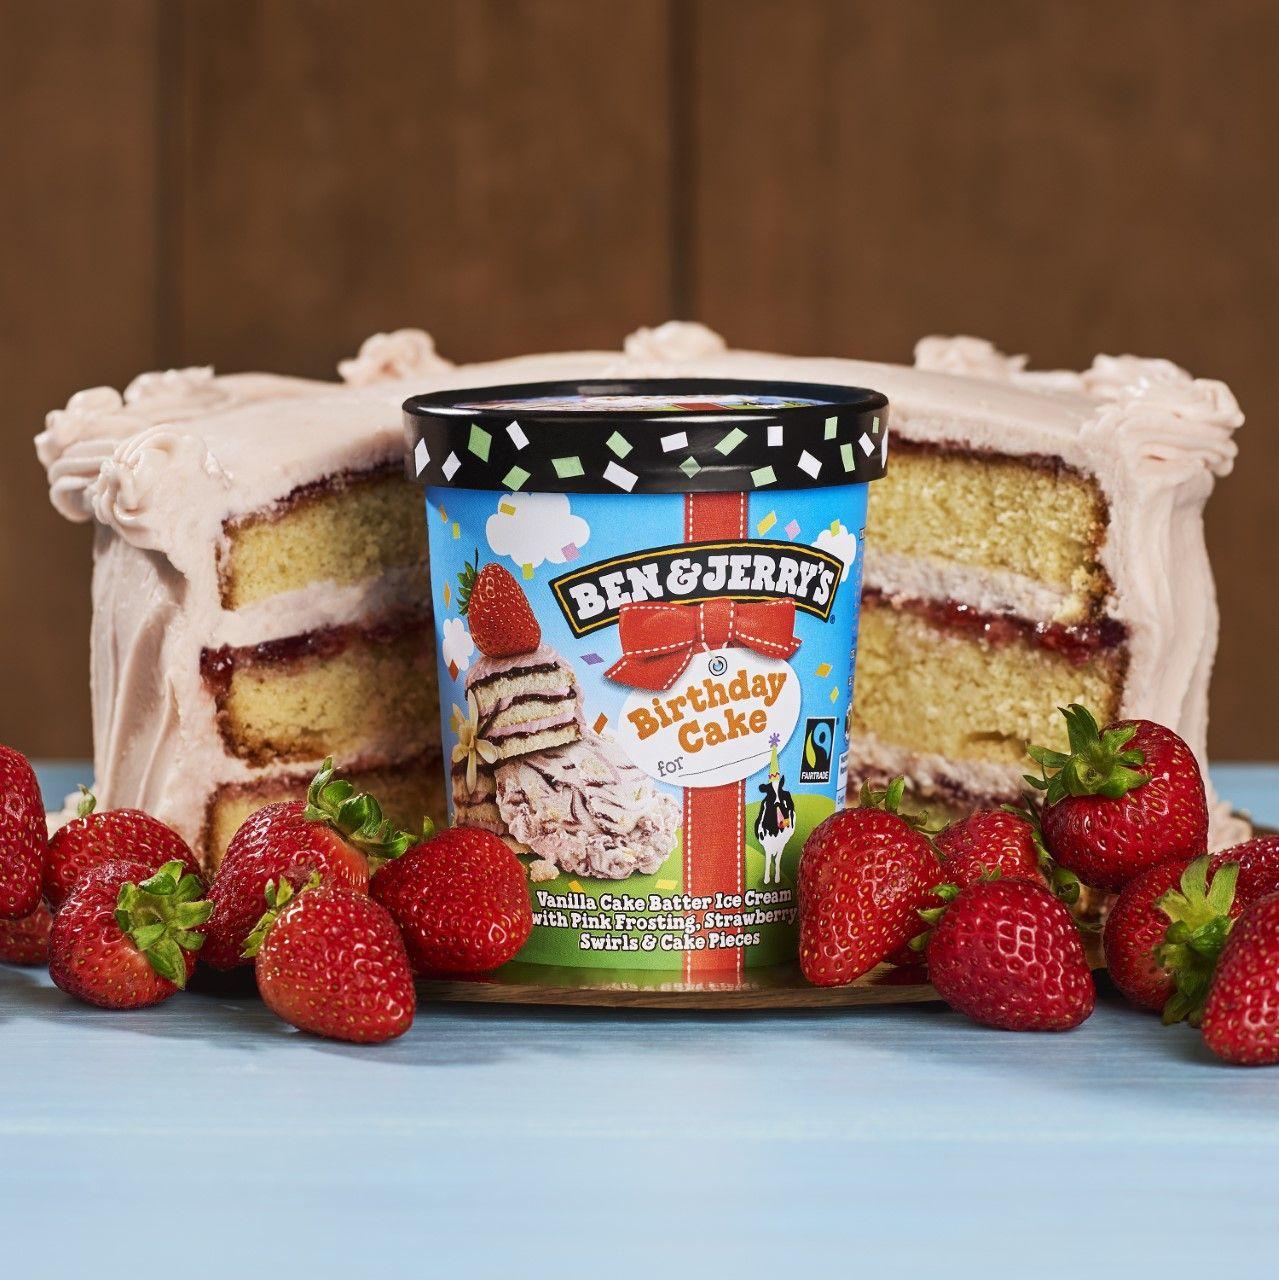 Ben Jerrys Newest Ice Cream Is Birthday Cake Flavour